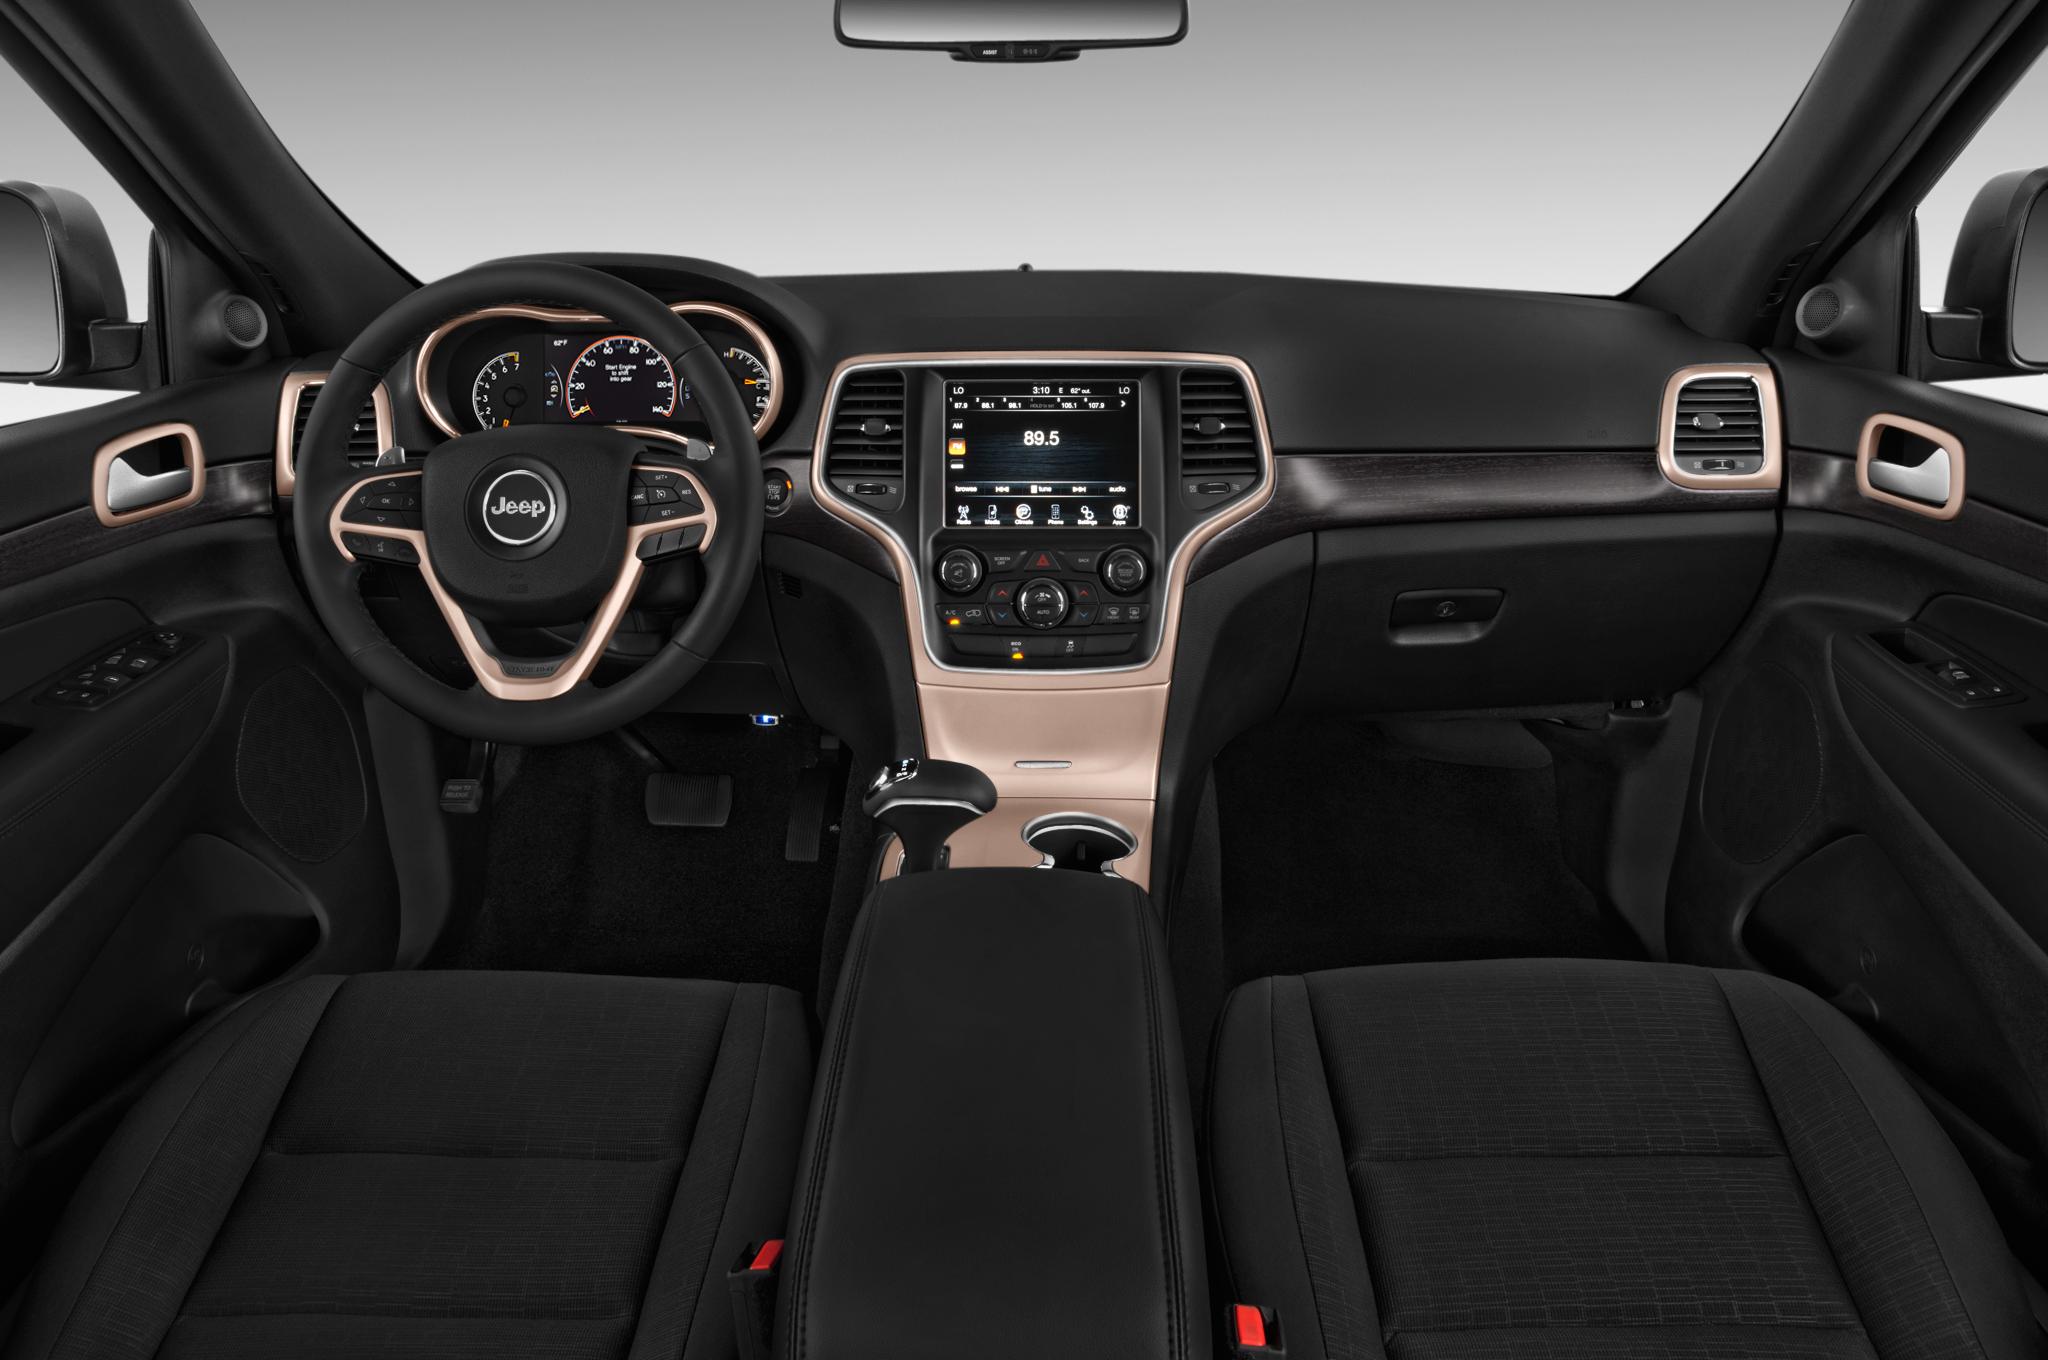 2015 jeep grand cherokee laredo interior